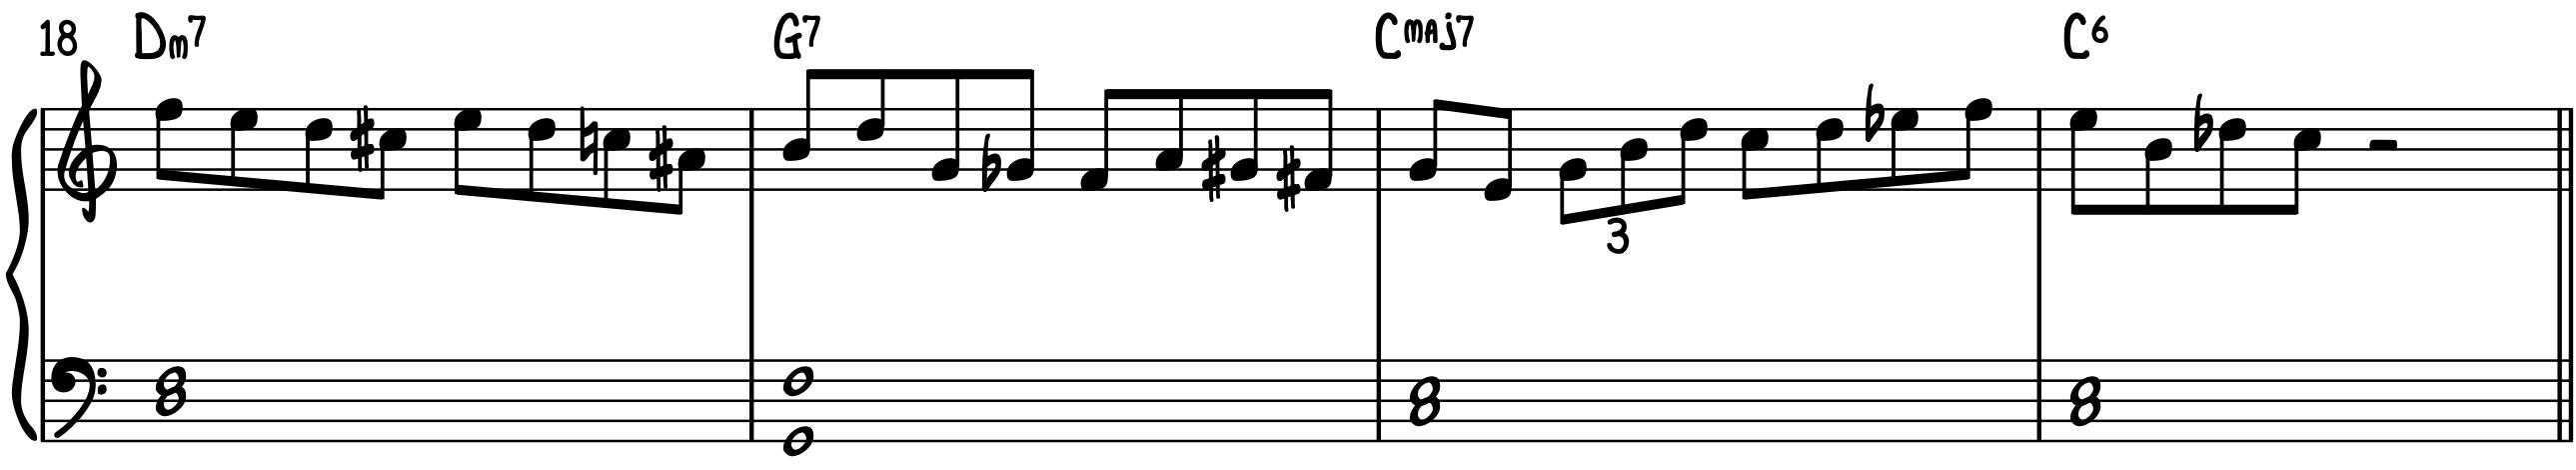 Play Bebop Piano Lines Example 1